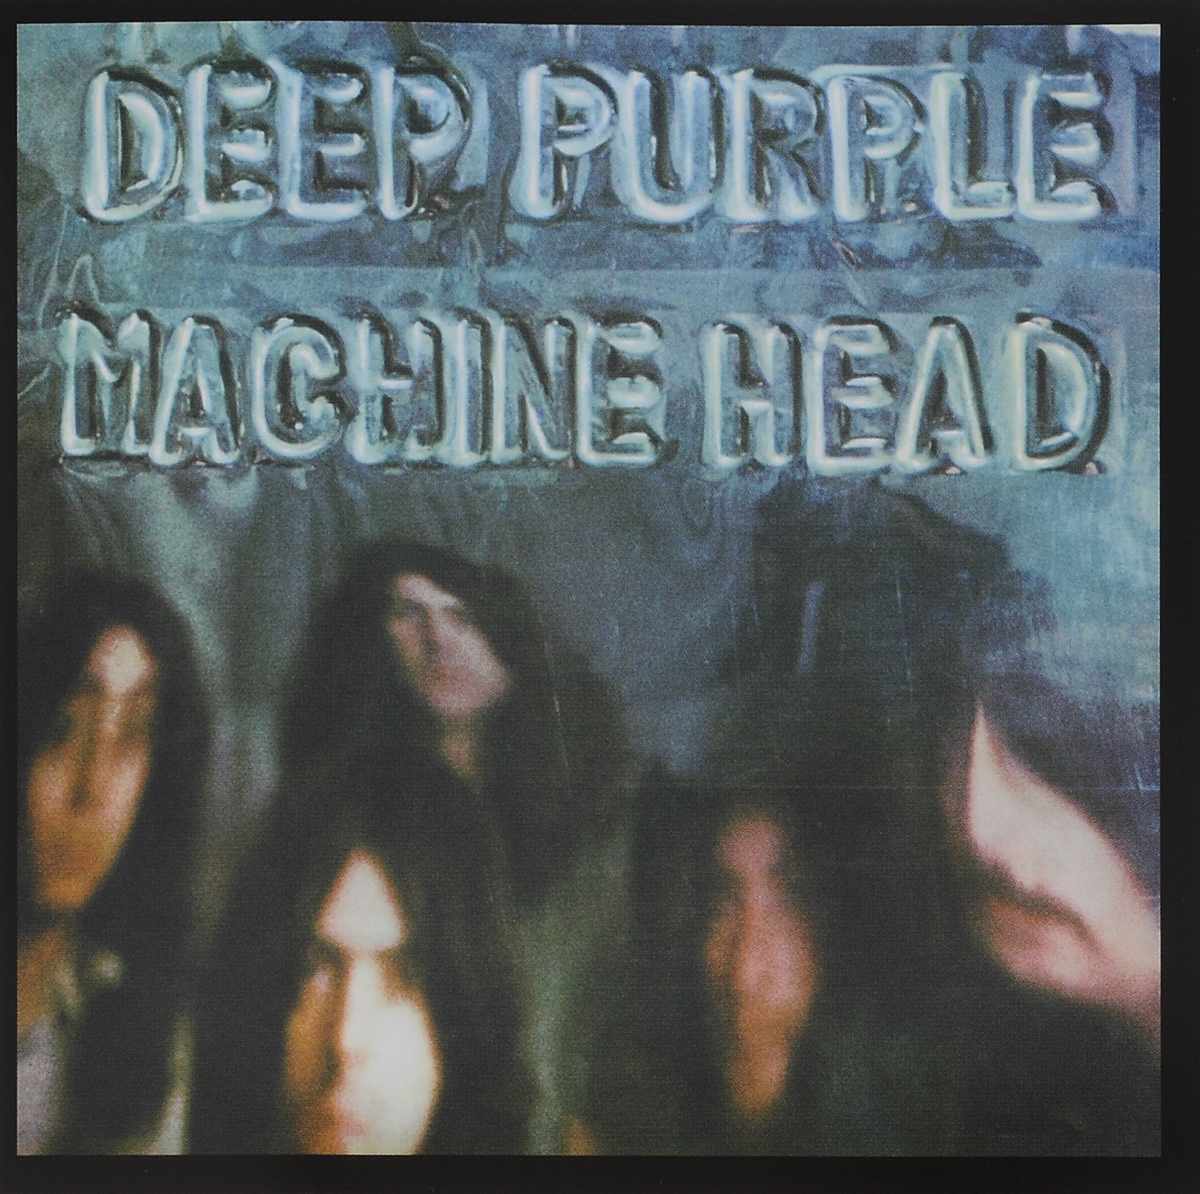 """Deep Purple"" Deep Purple. Machine Head"